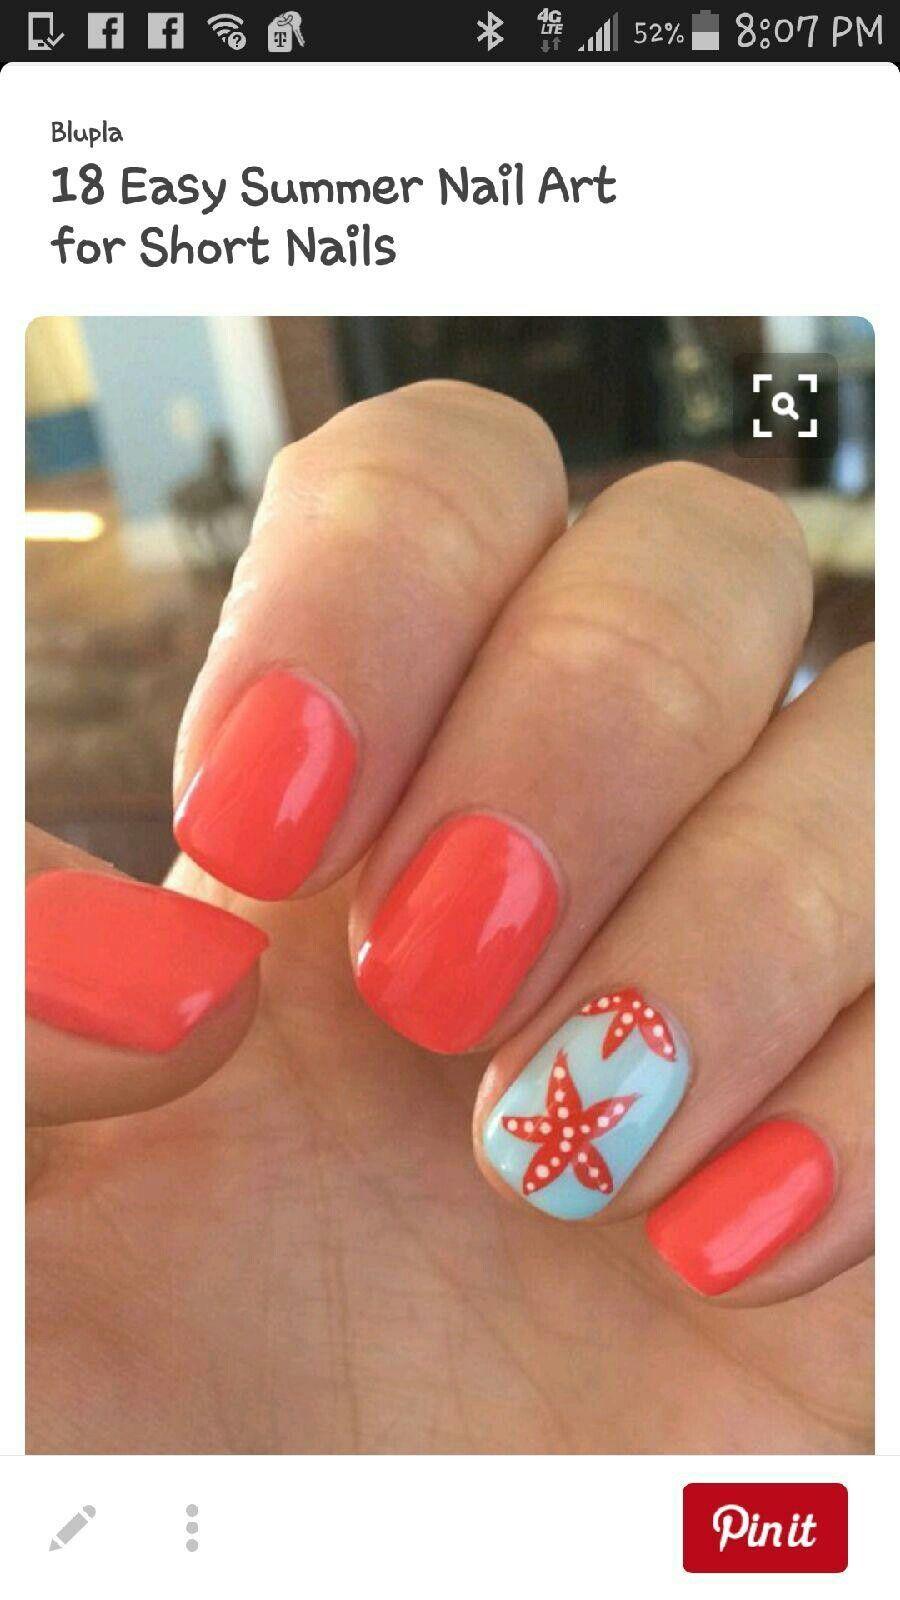 Pin By Chris Cox On Nails Pinterest Mani Pedi Pedi And